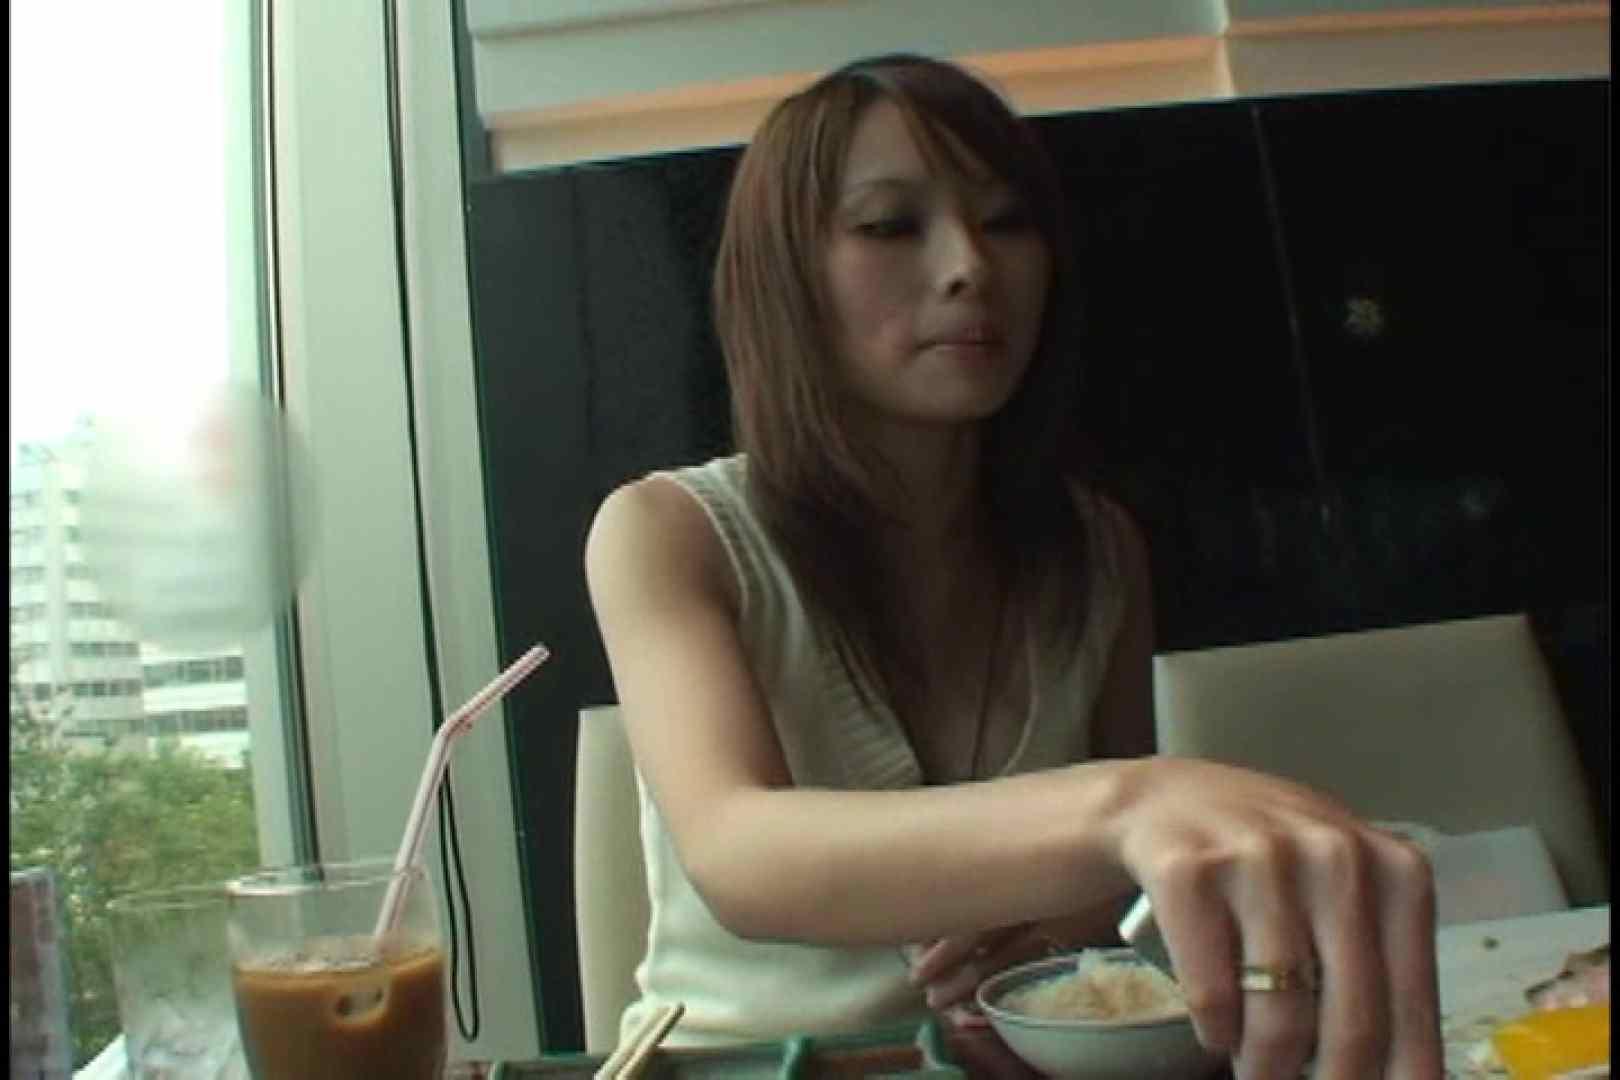 JDハンター全国ツアー vol.031 前編 女子大生のエロ動画 | 0  97PIX 47